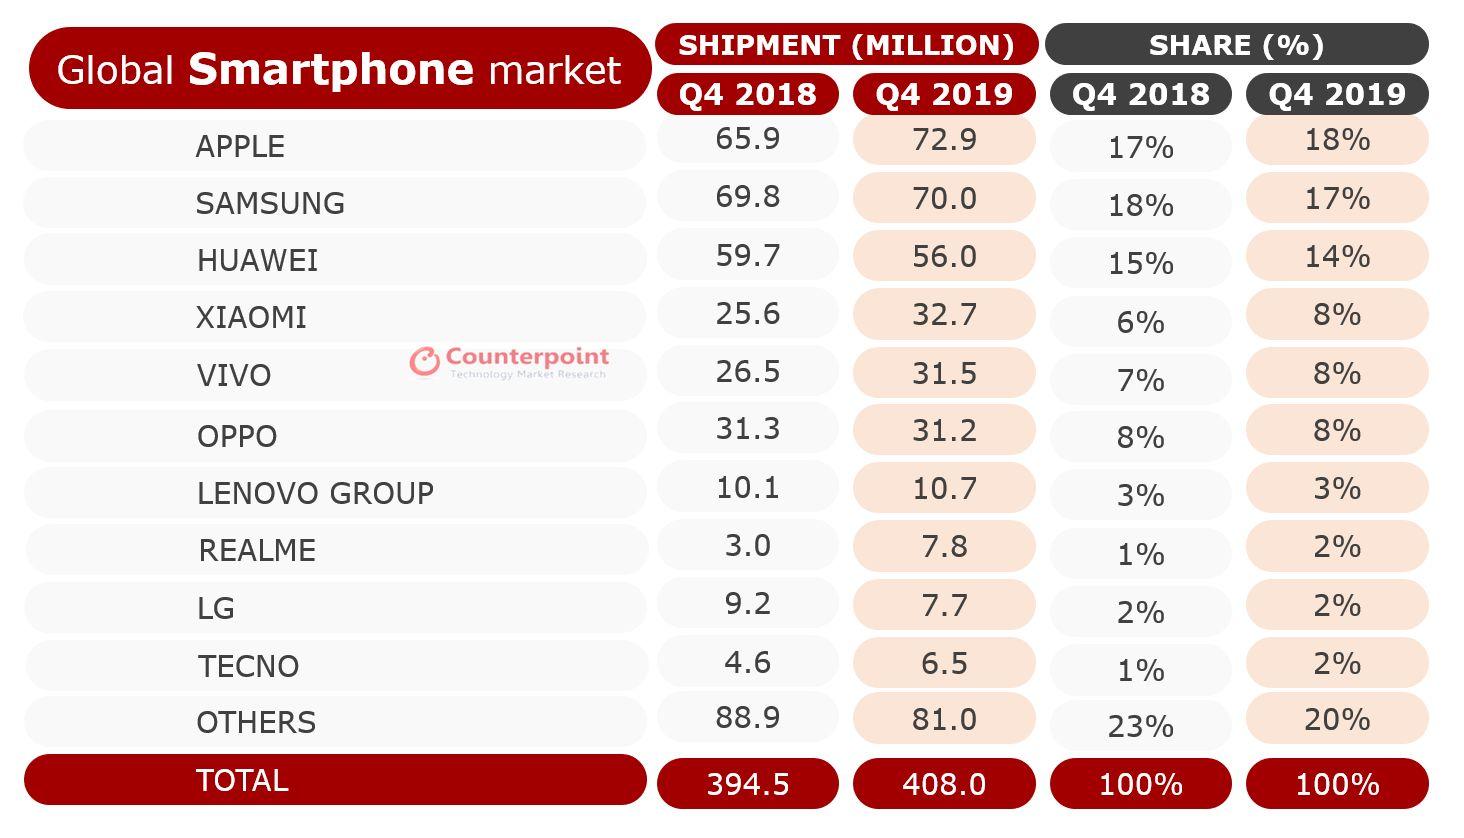 Prodaja pametnih telefona Q4 2019 Counterpoint 30.01.2020